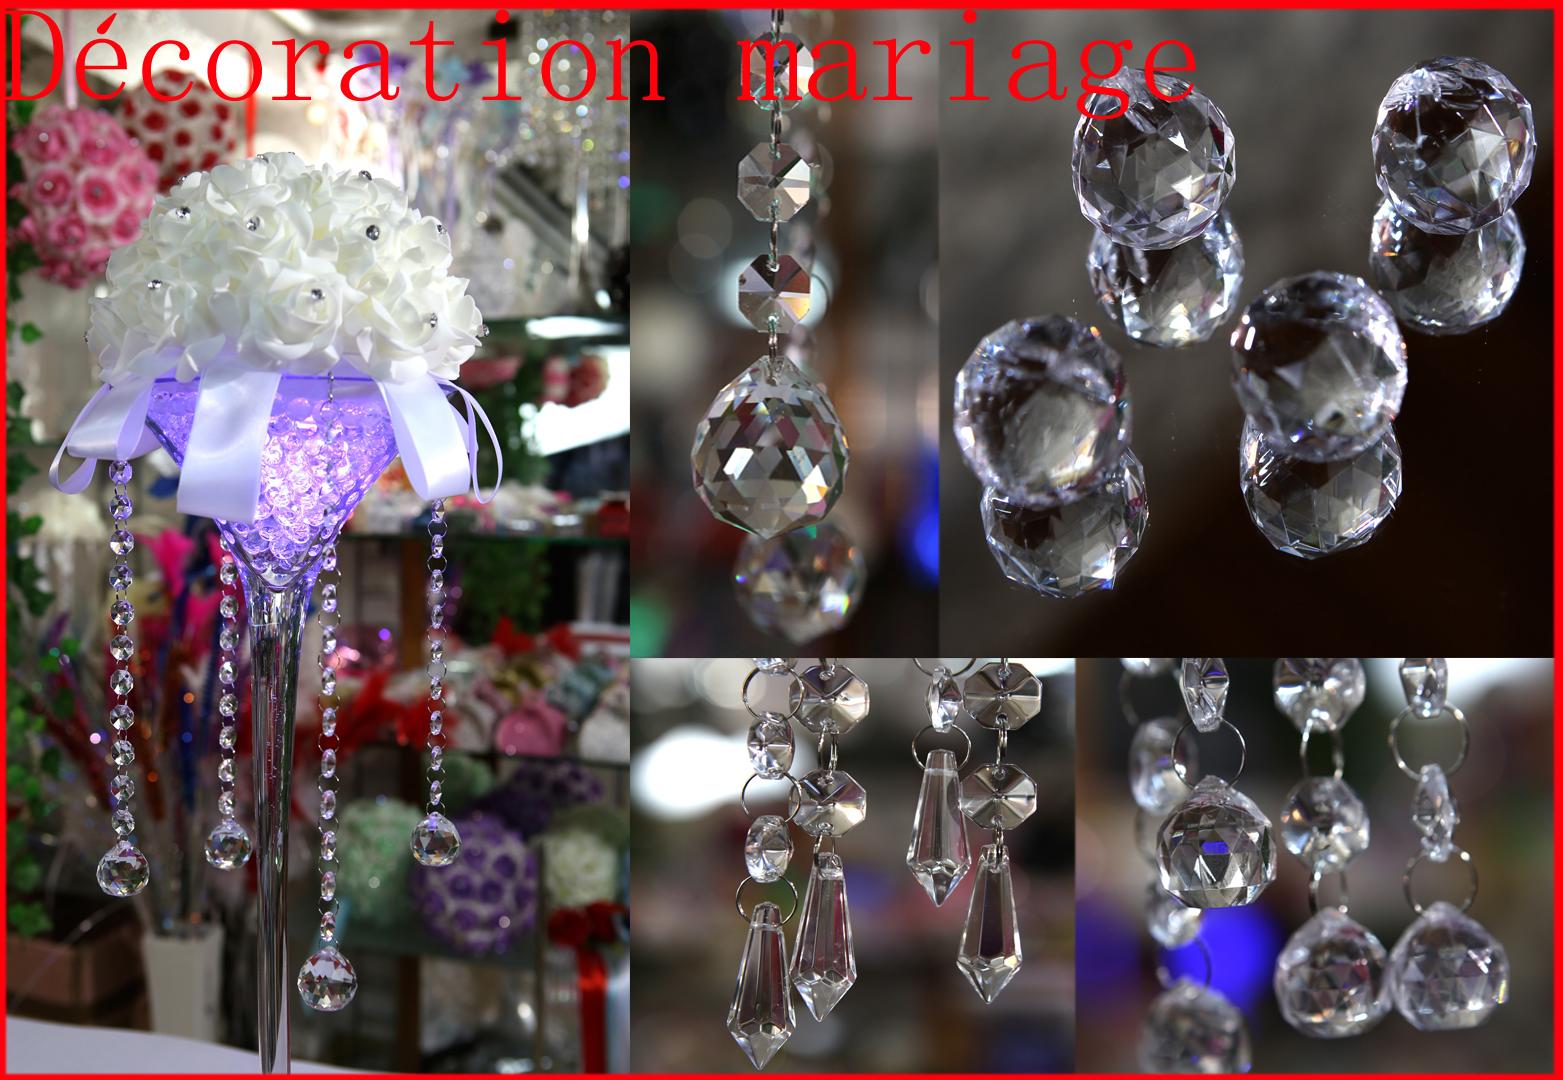 Kit de 4 chaîne Crystal / verre guirlande + pampille décoration mariage MDK